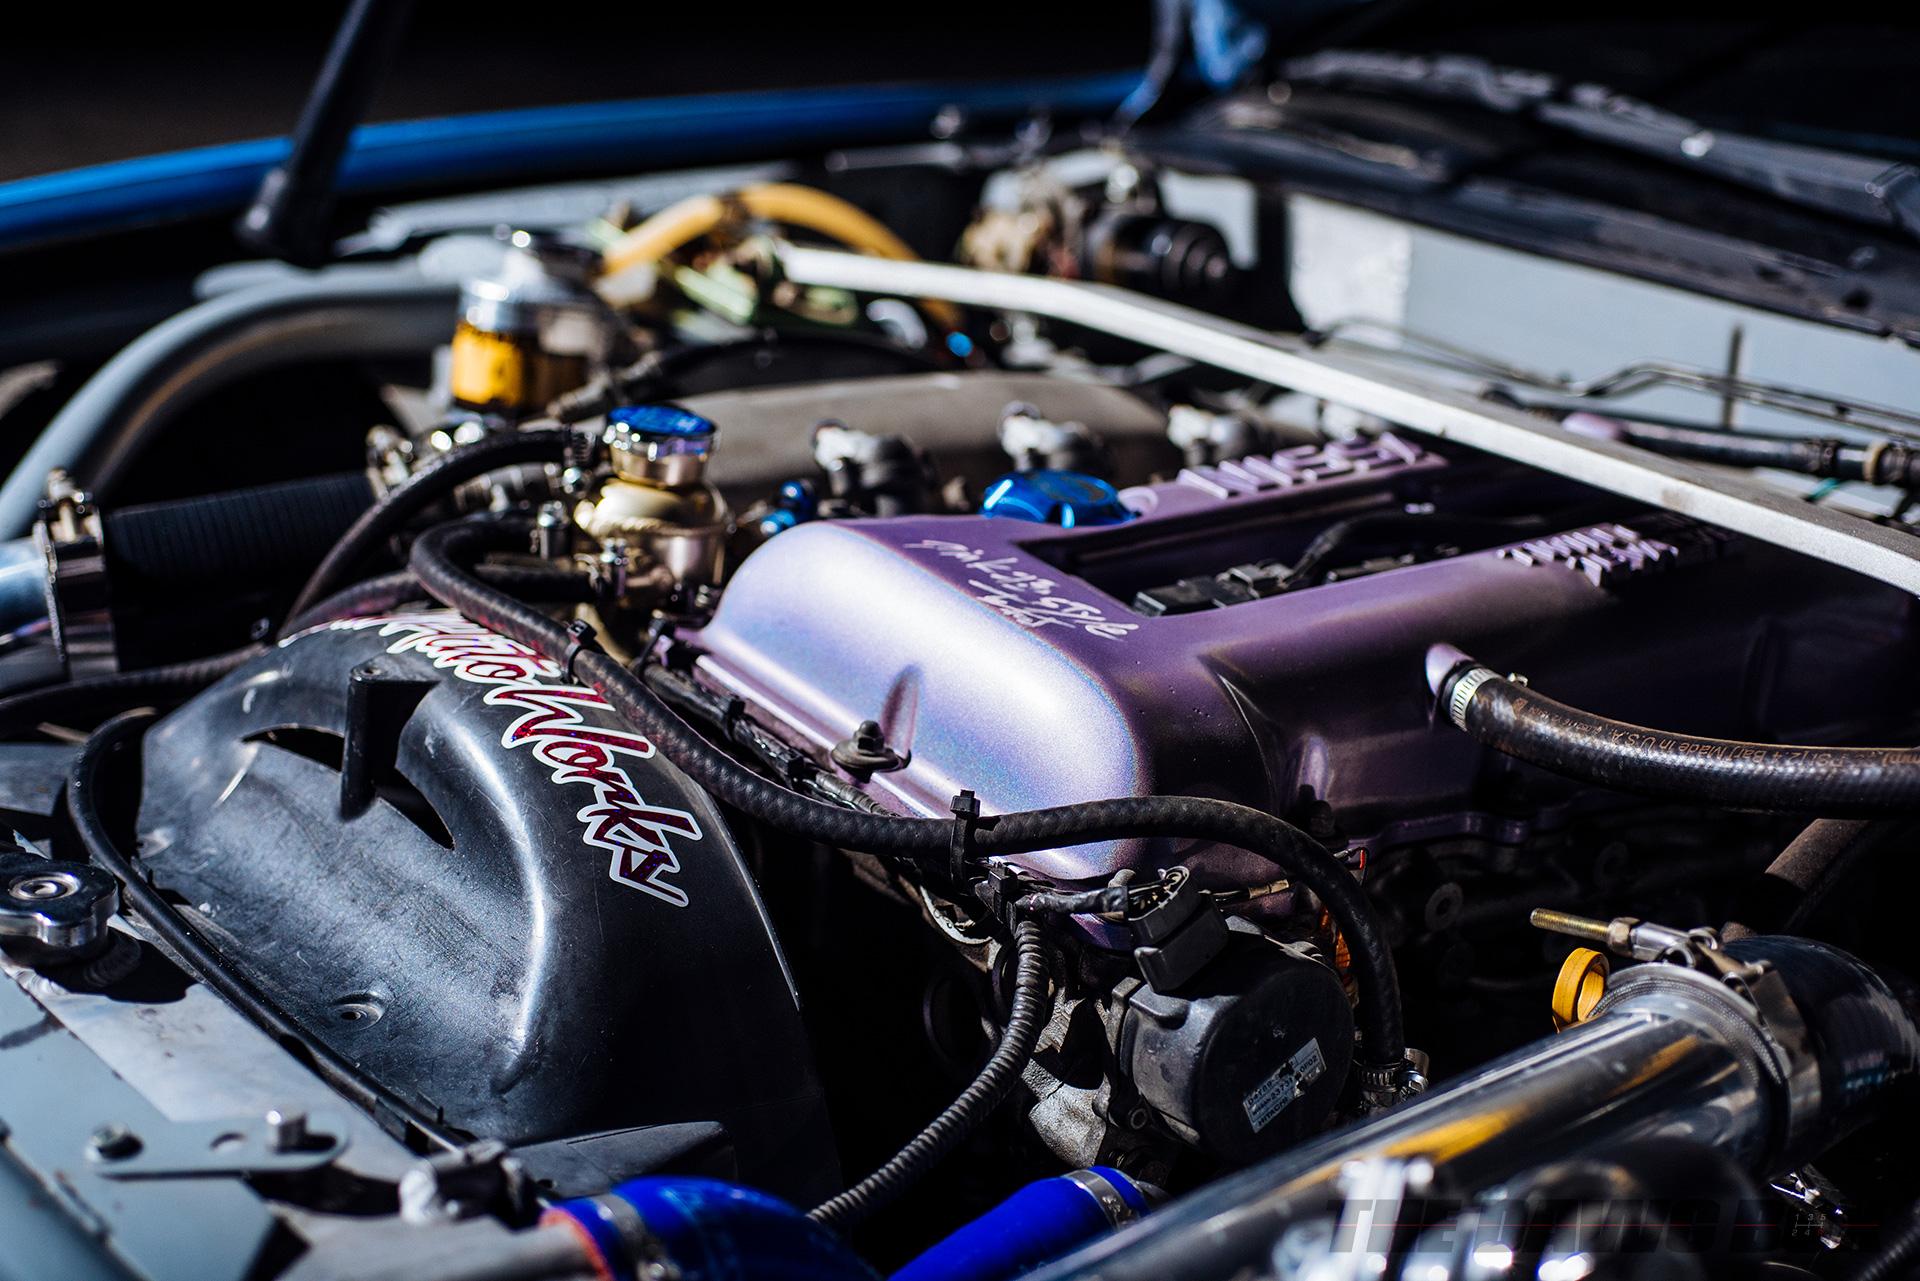 Brian Macias' 1989 Nissan 240SX S13 Coupe, SR20DET Engine